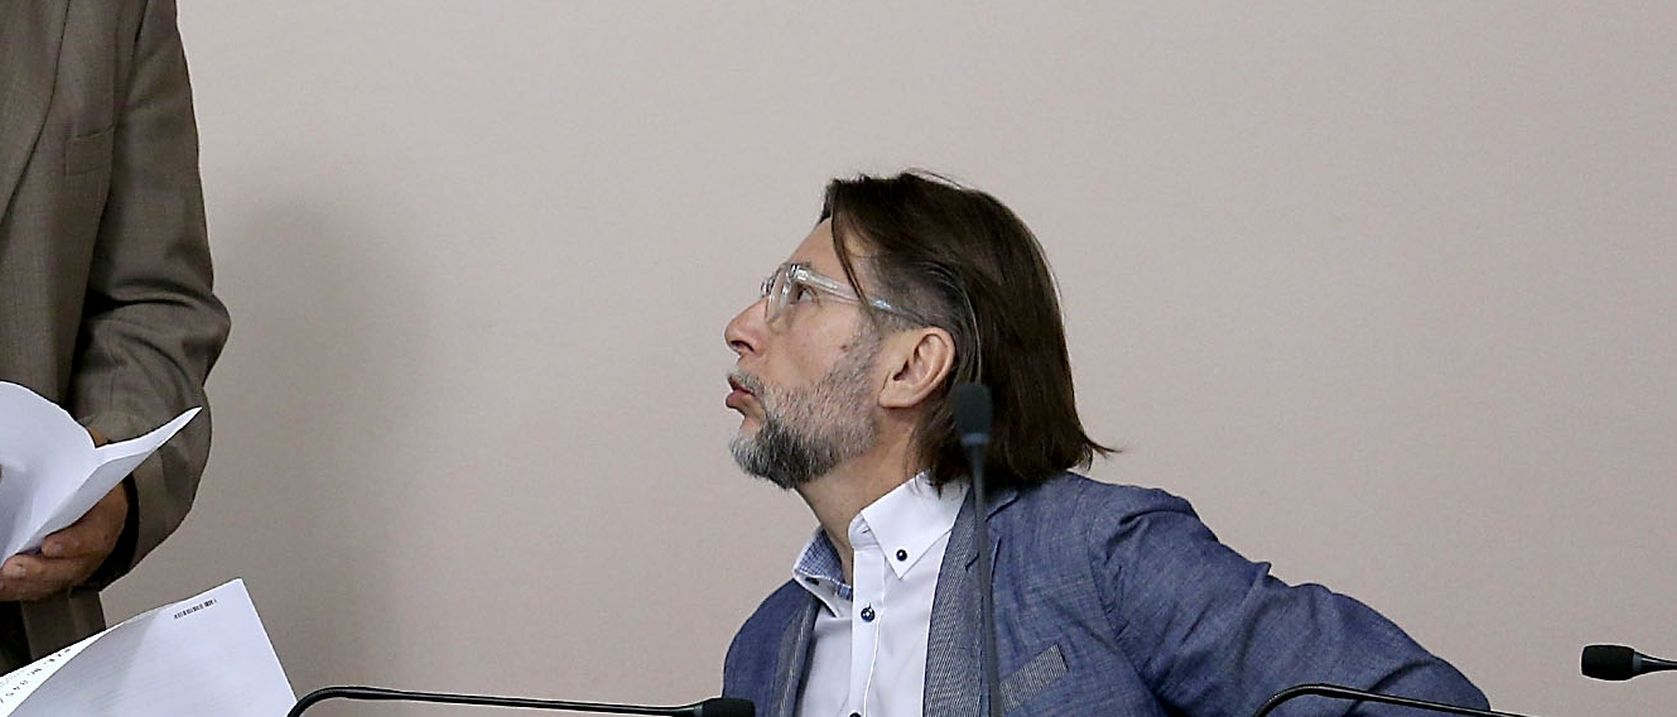 PEKING Saborski zastupnik Branko Vukšić usred otmice zrakoplova